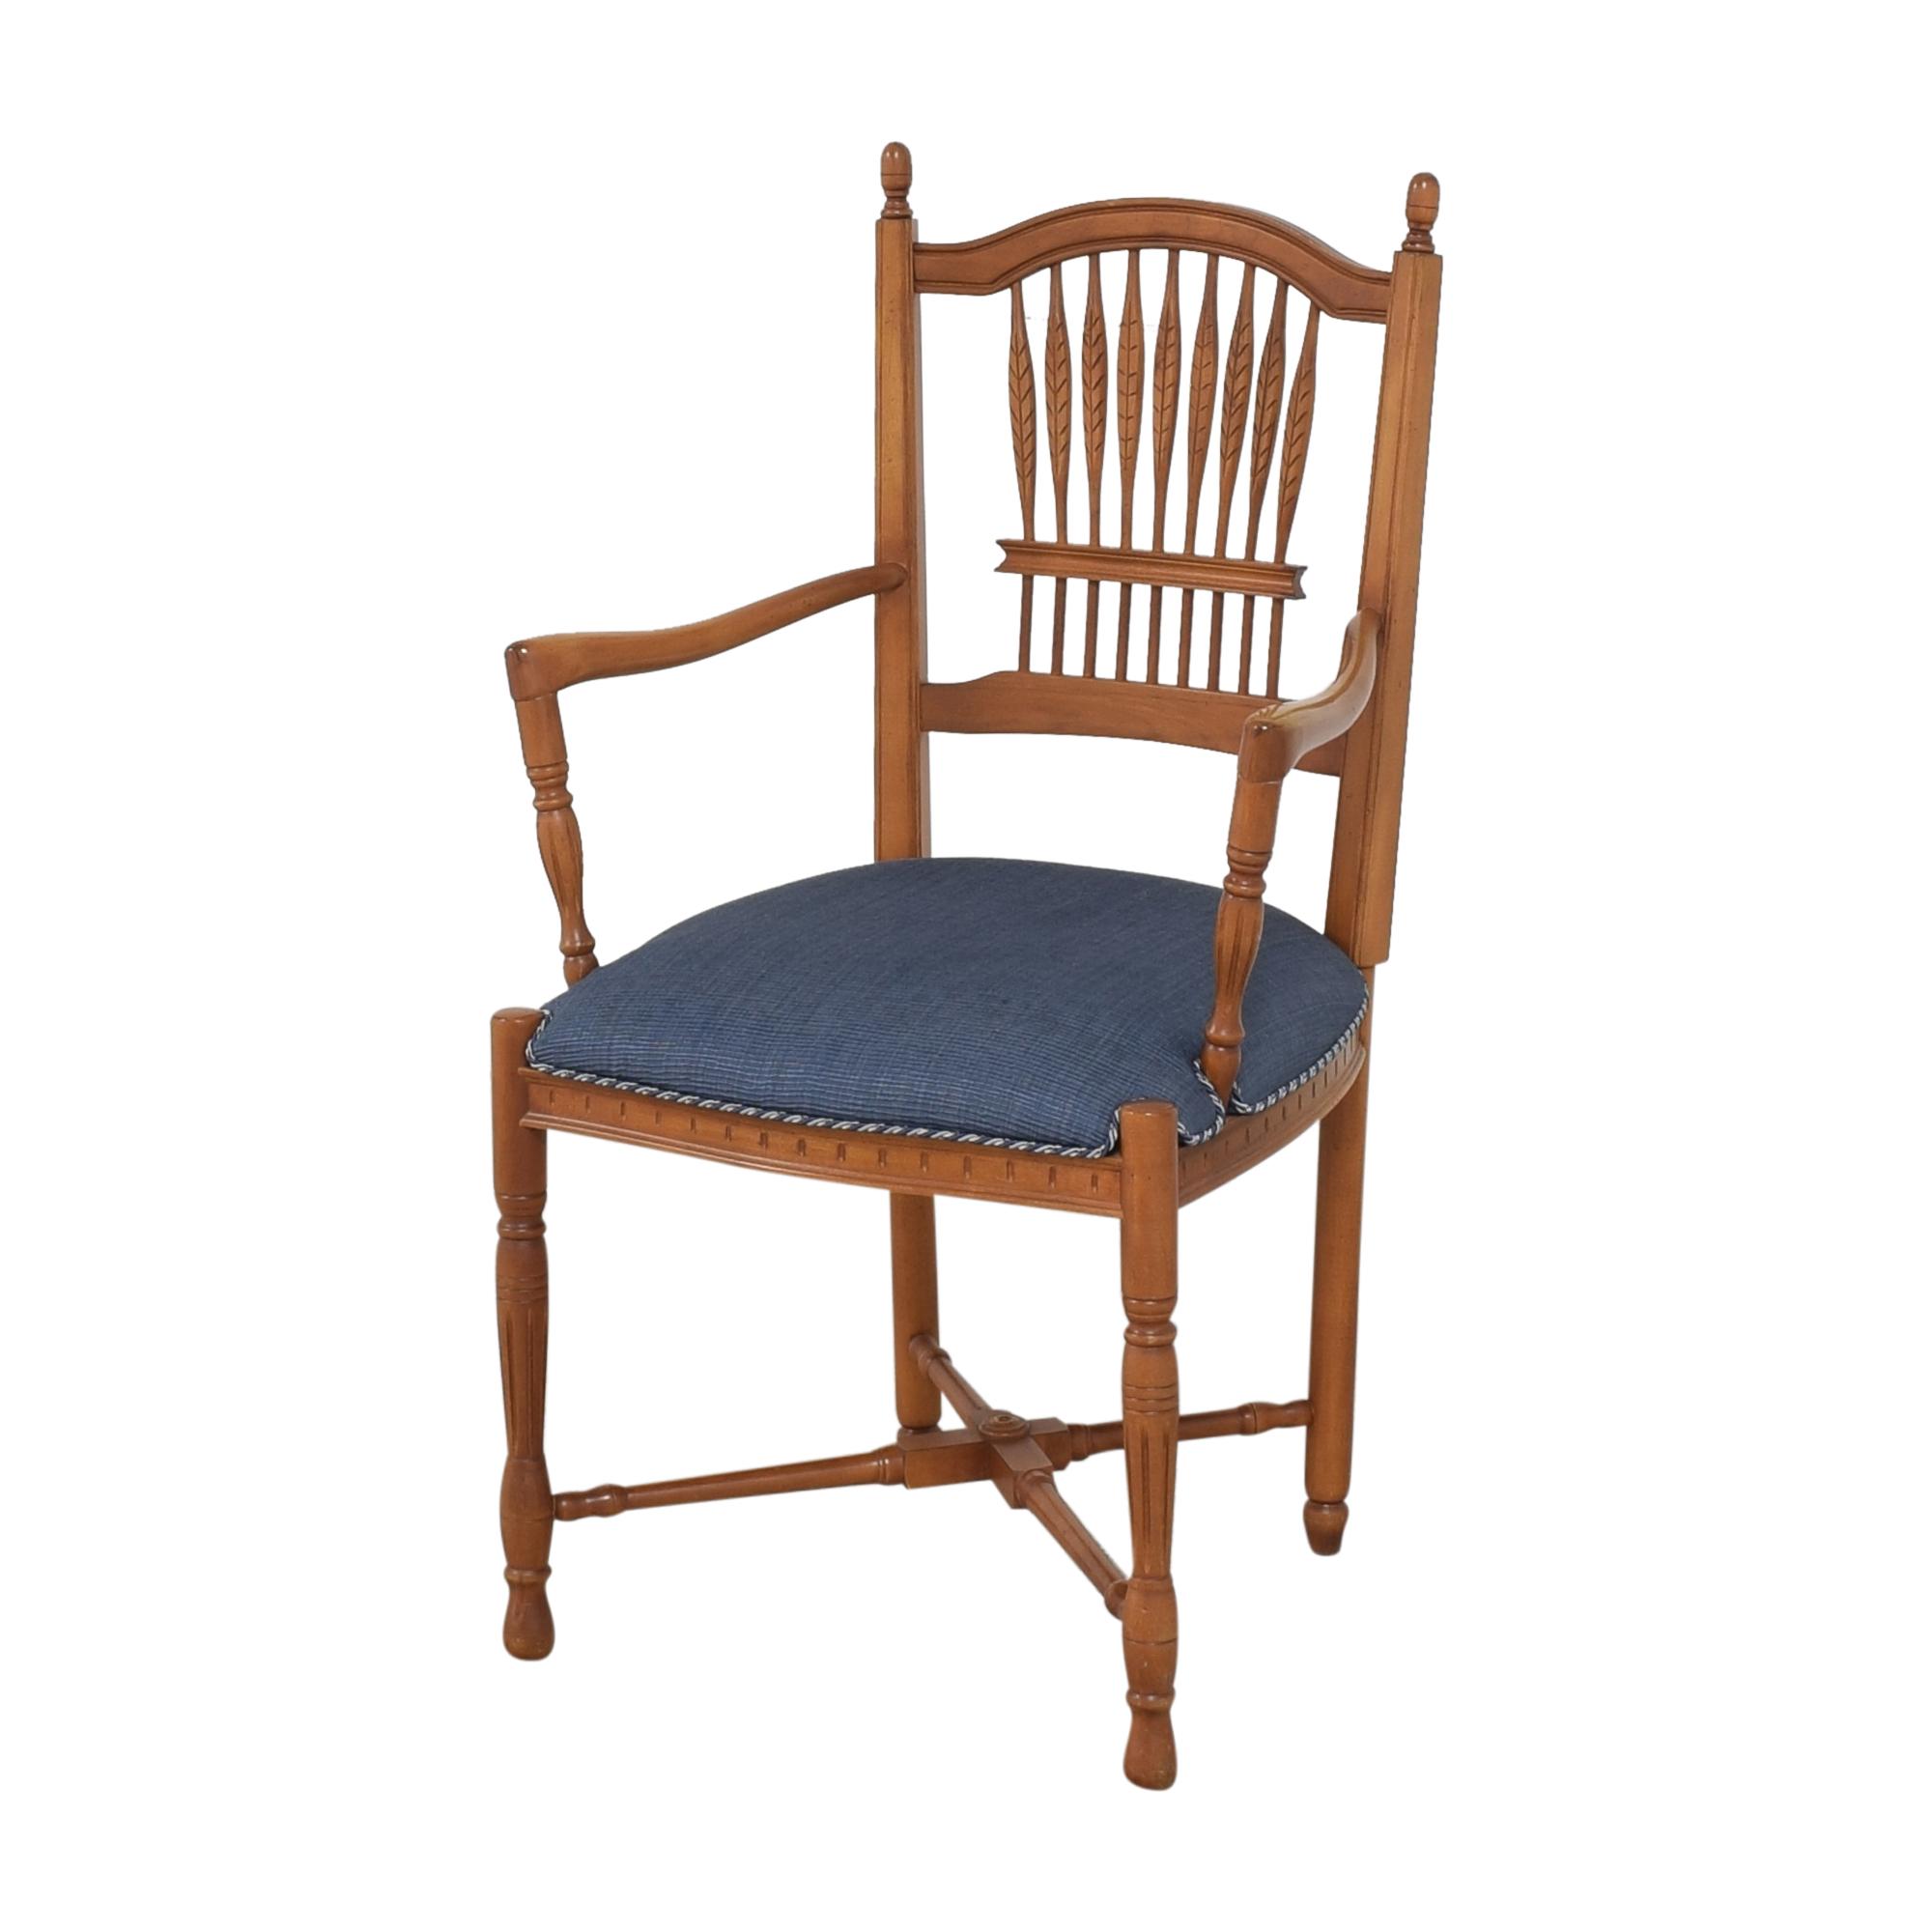 Ethan Allen Ethan Allen Wheatback Chair Accent Chairs